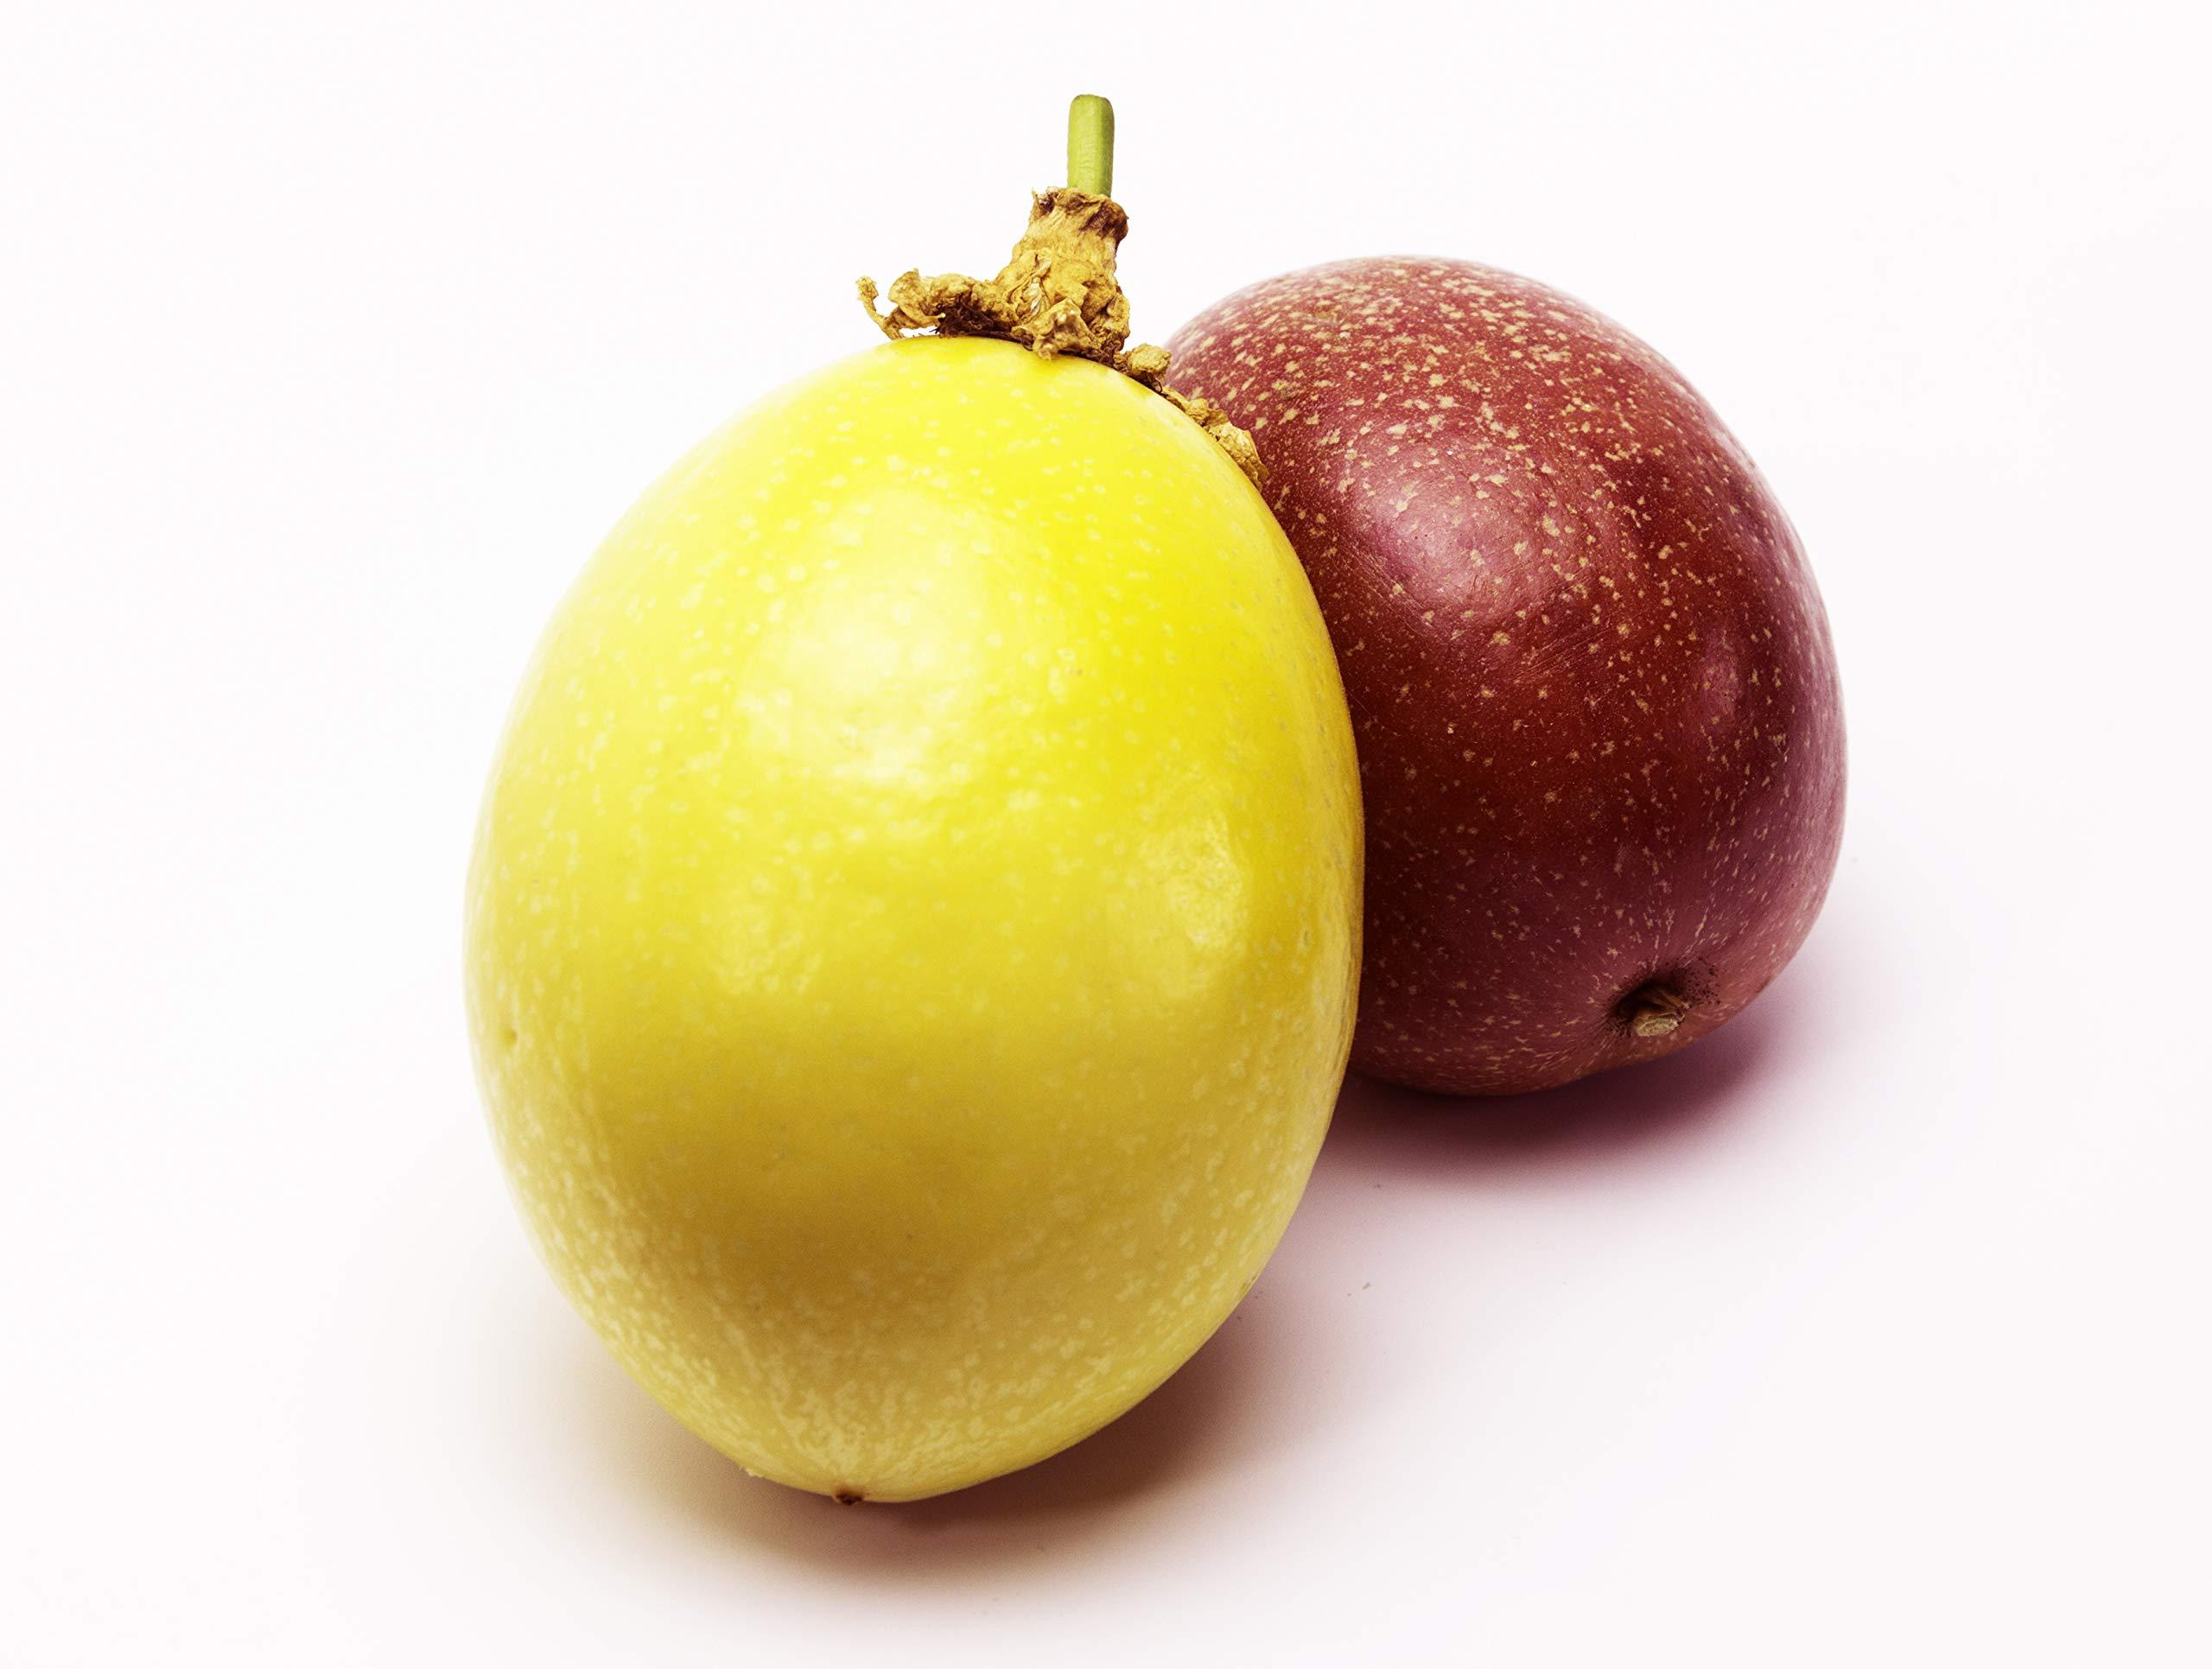 Passion Fruit Buy Online In Lebanon At Lebanon Desertcart Com Productid 82457481